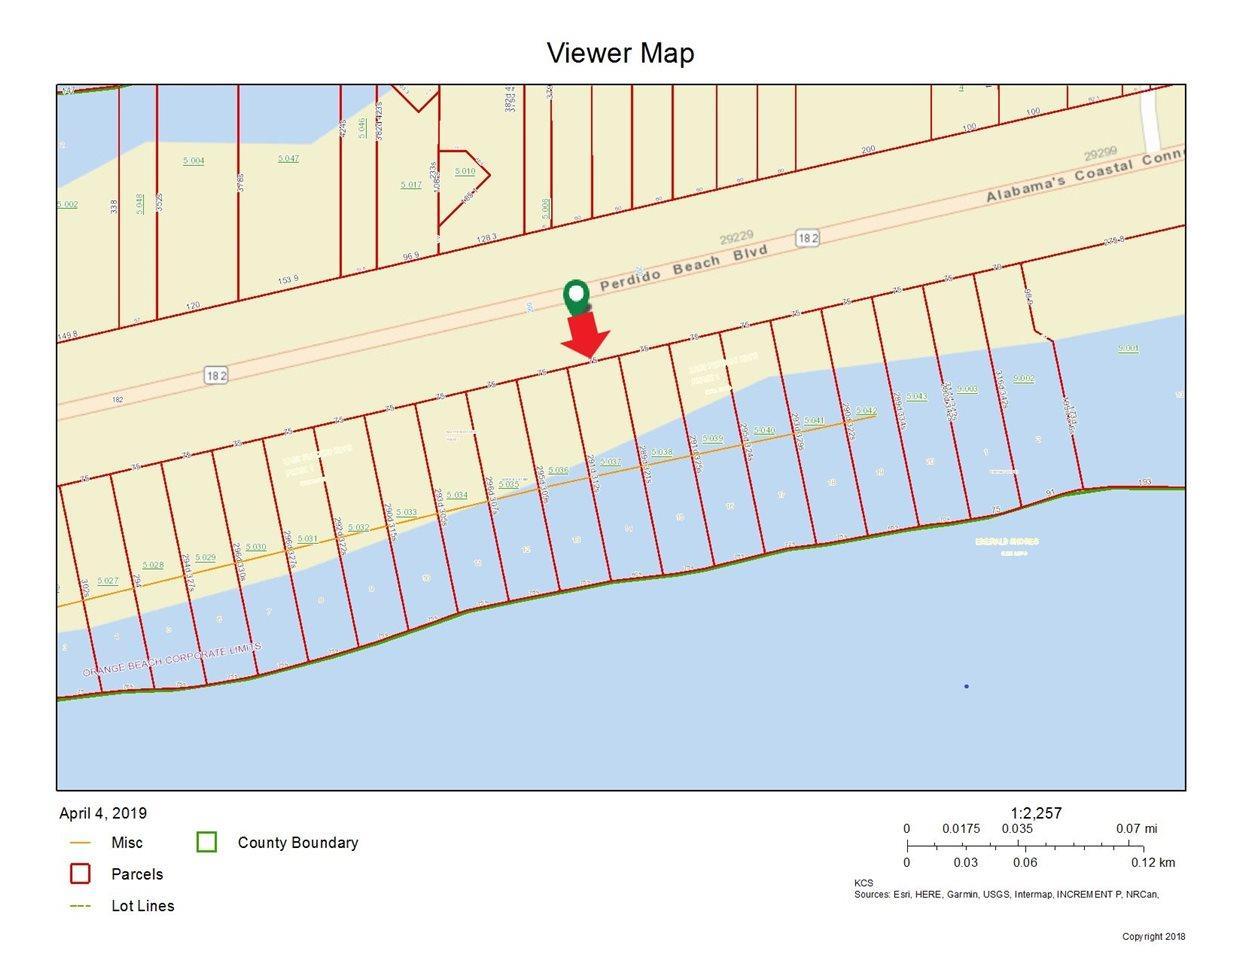 29140 Perdido Beach Blvd, Orange Beach, AL 36561